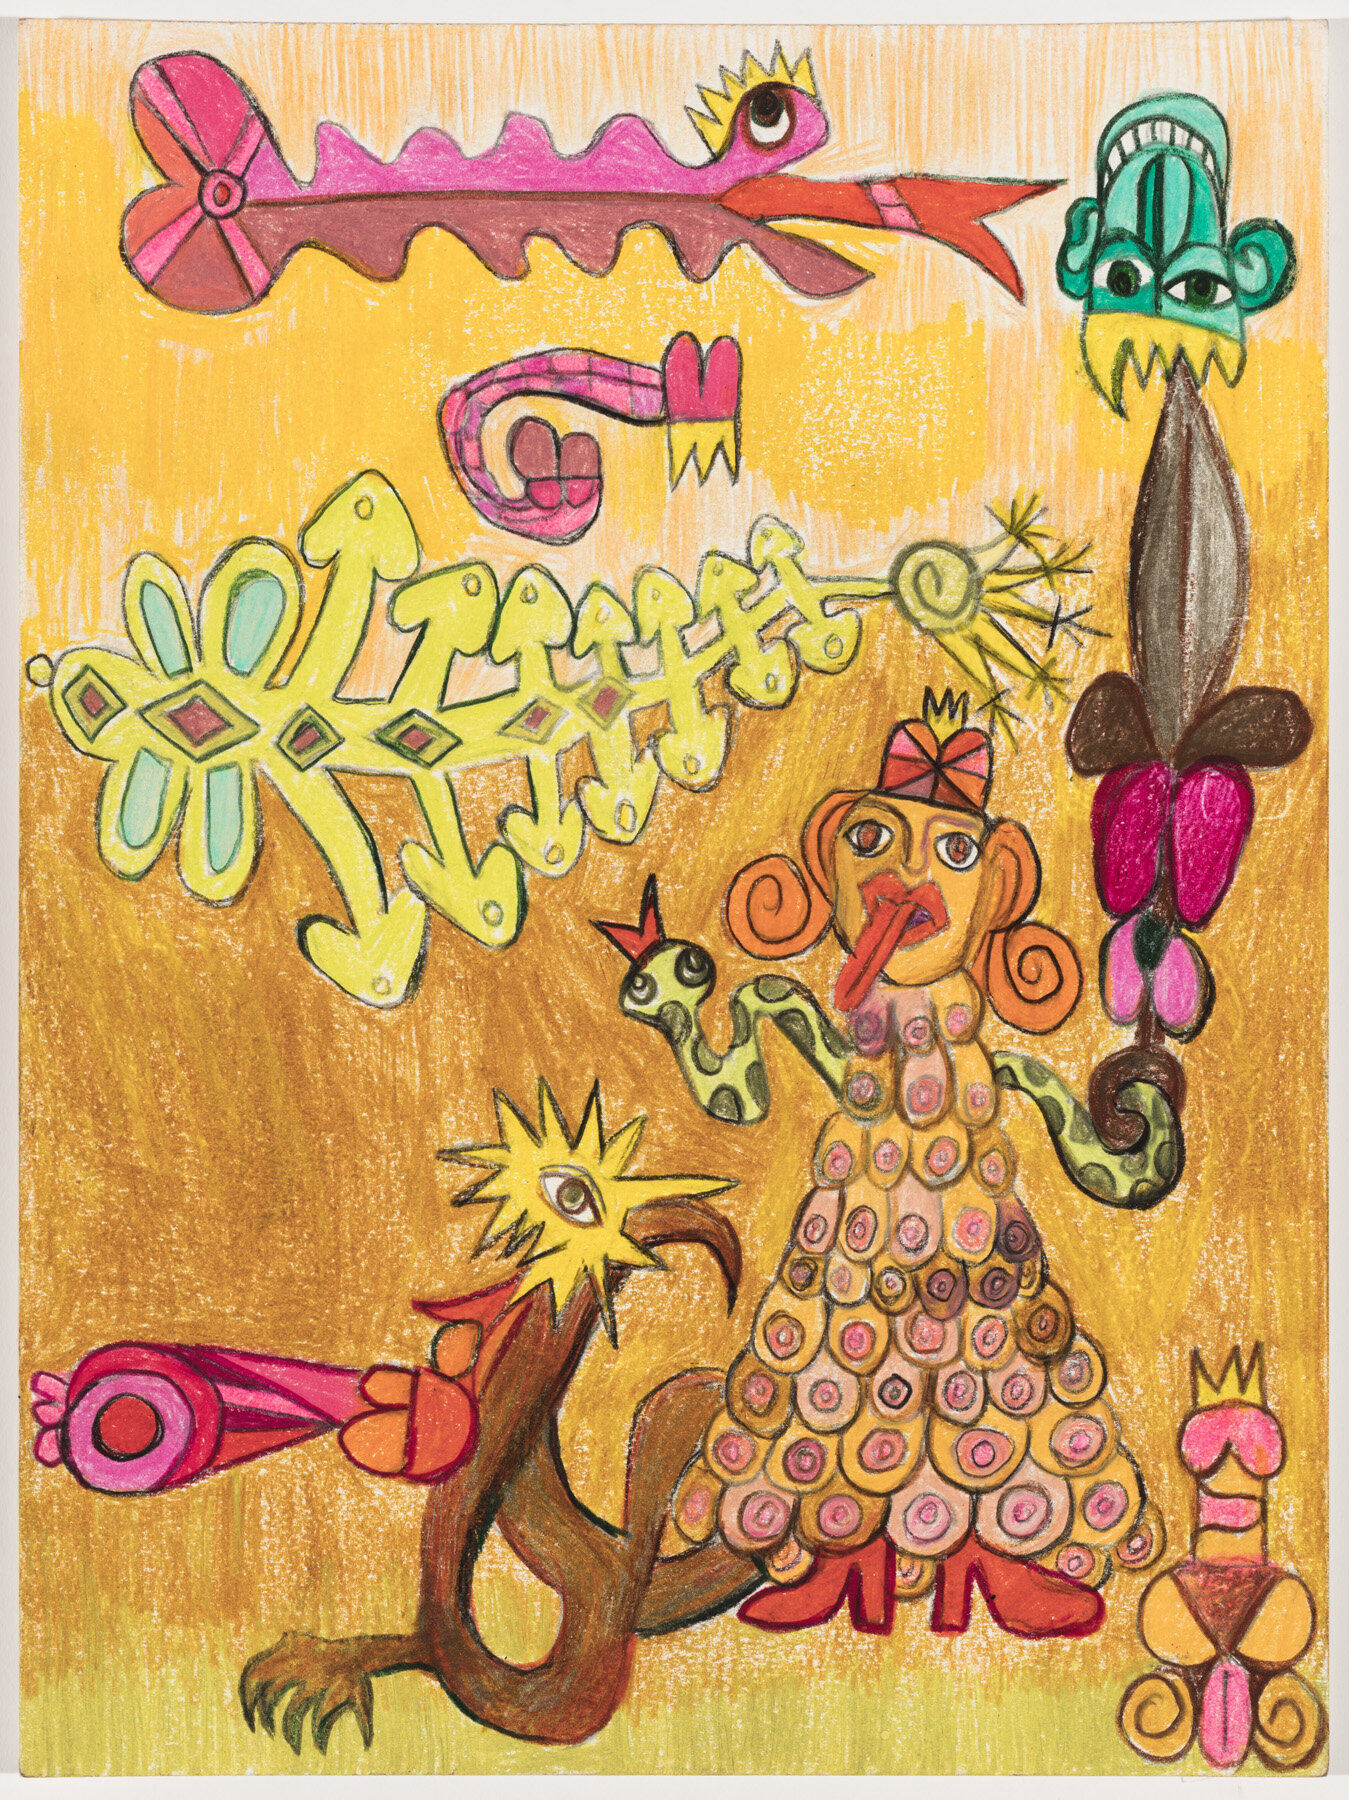 "Ms. Judy Artemissy (2019) Watercolor pencil on paper, 12x9"""